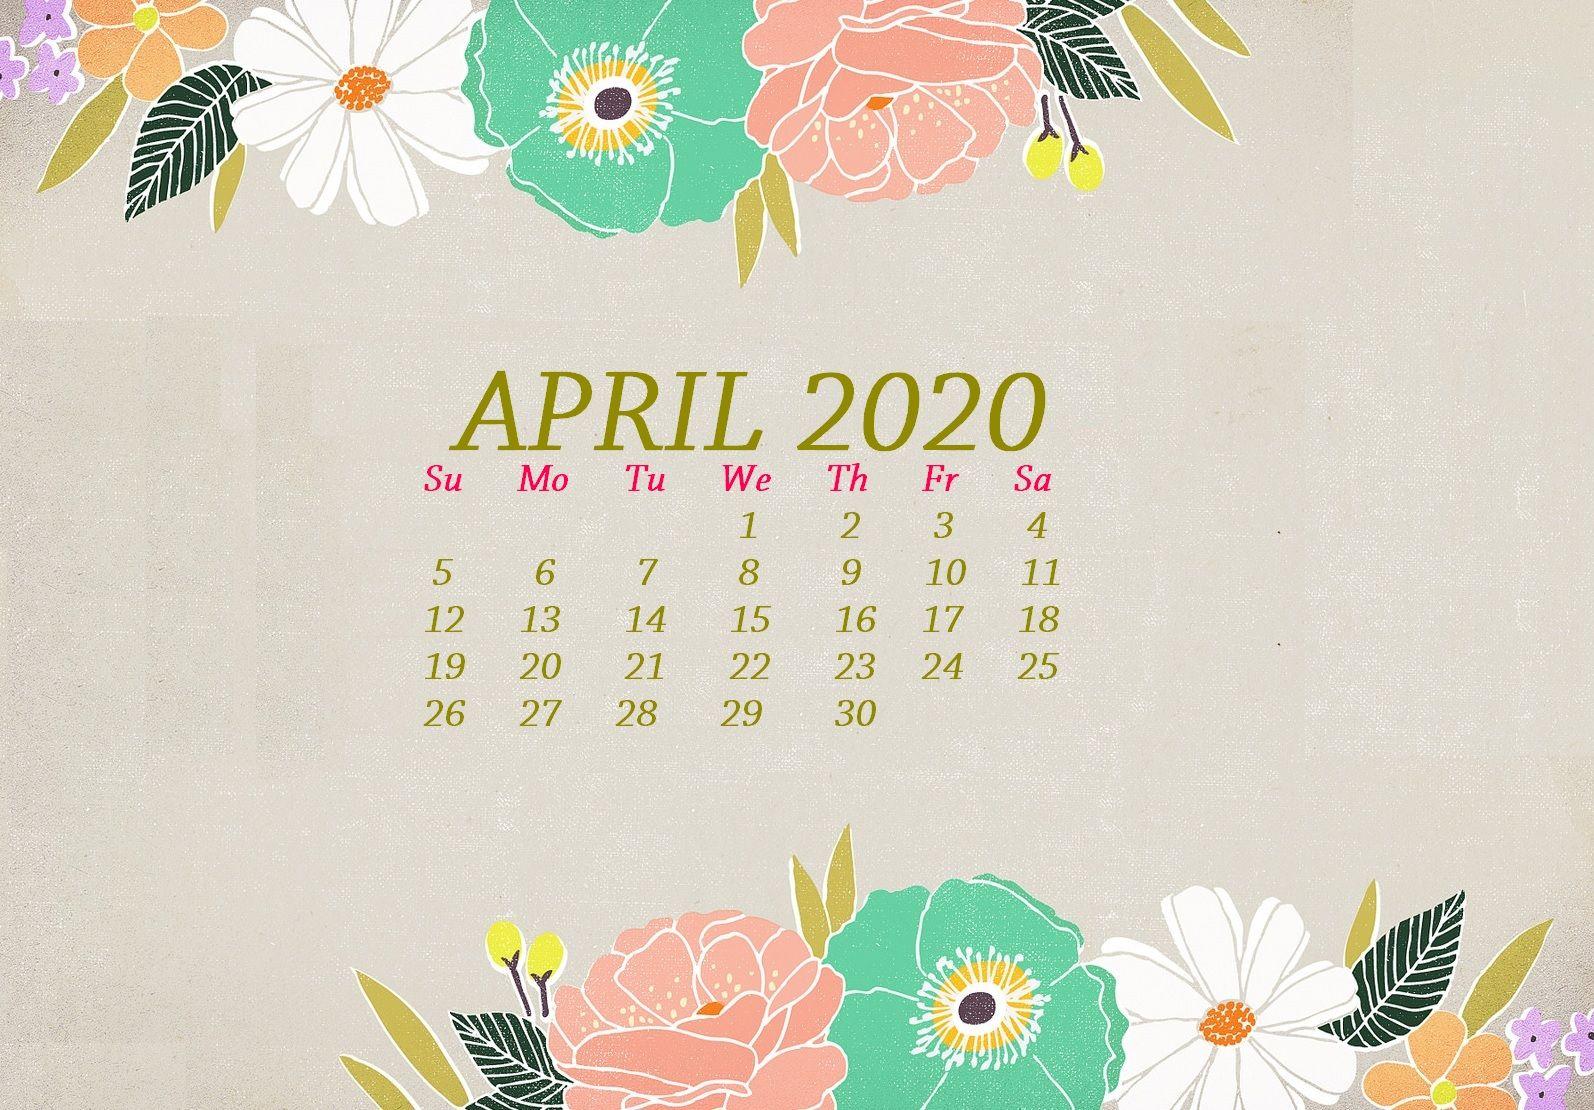 Floral Calendar Wallpaper April 2020 In 2020 Calendar Wallpaper